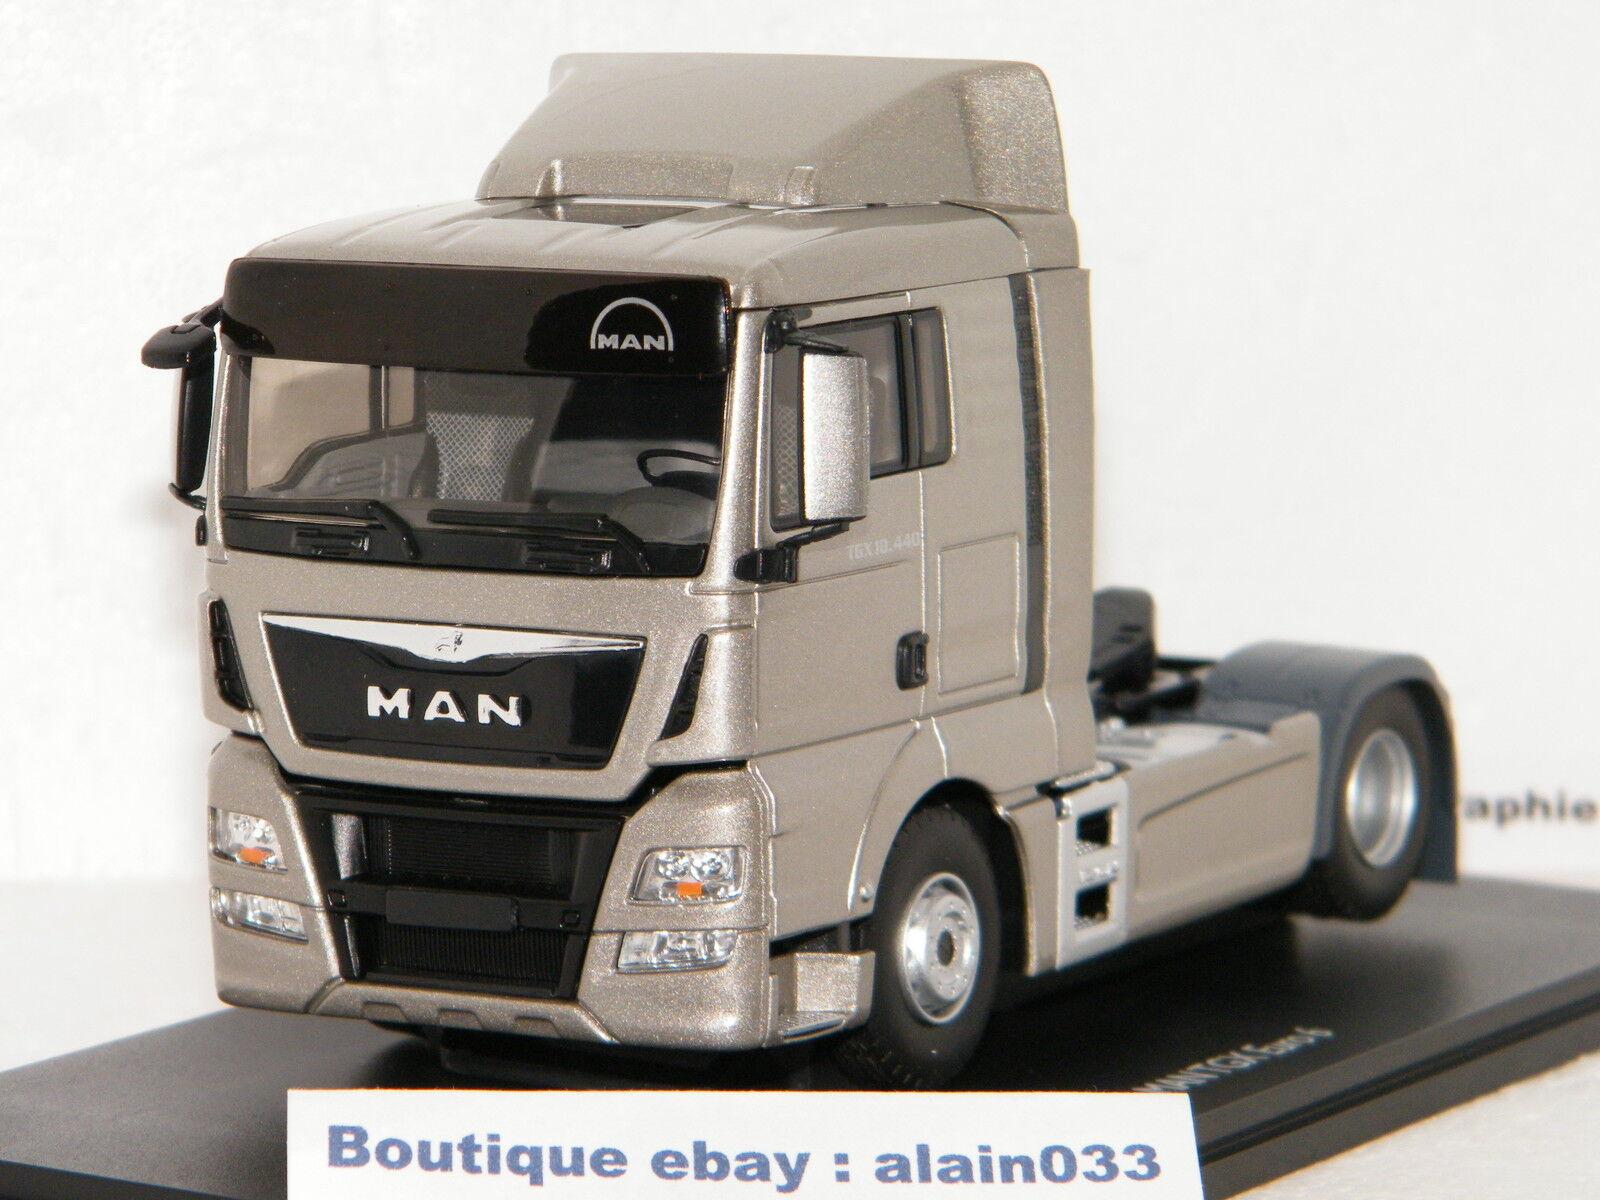 MAN TGX EURO 6 LX plata METALLIC TRACTEUR SEUL ELIGOR 1 43 Ref 115120